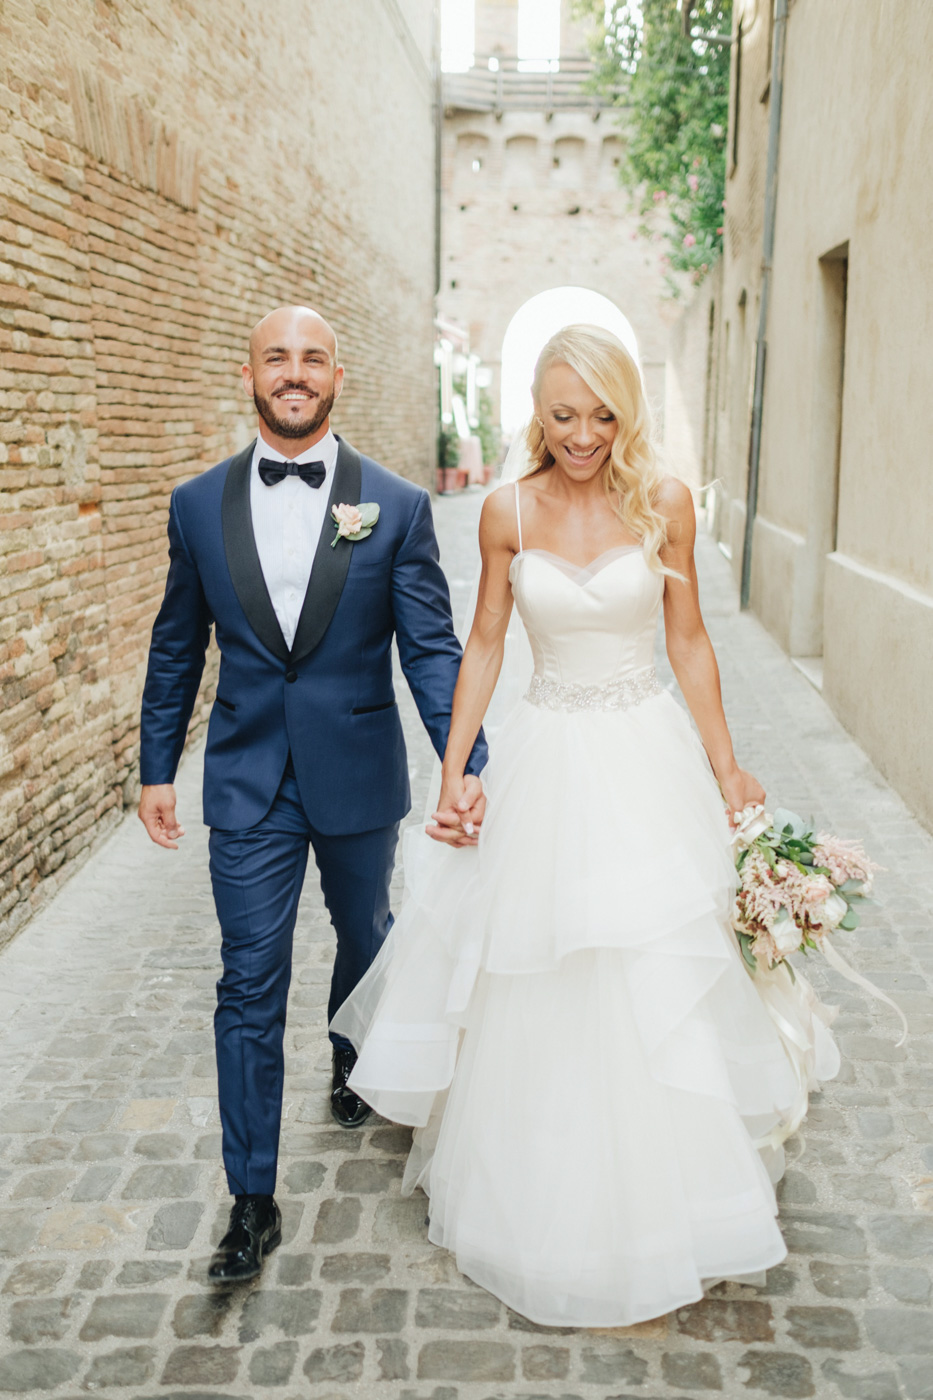 Matrimoni all'italiana wedding photographer italy-118.jpg